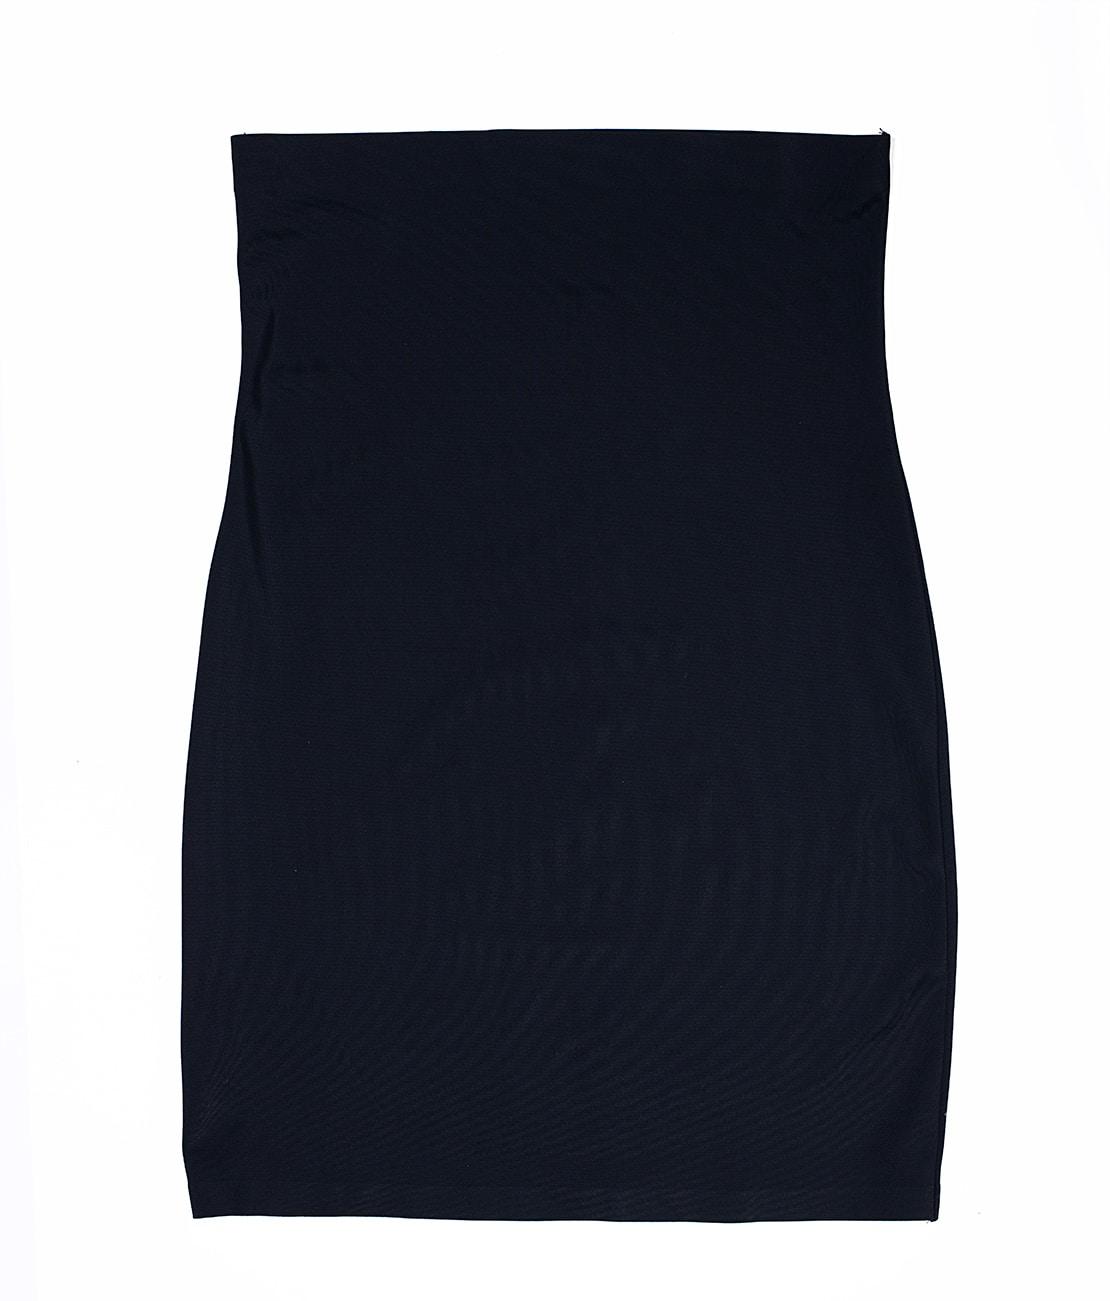 Fond de Robe Noir Packshot Front